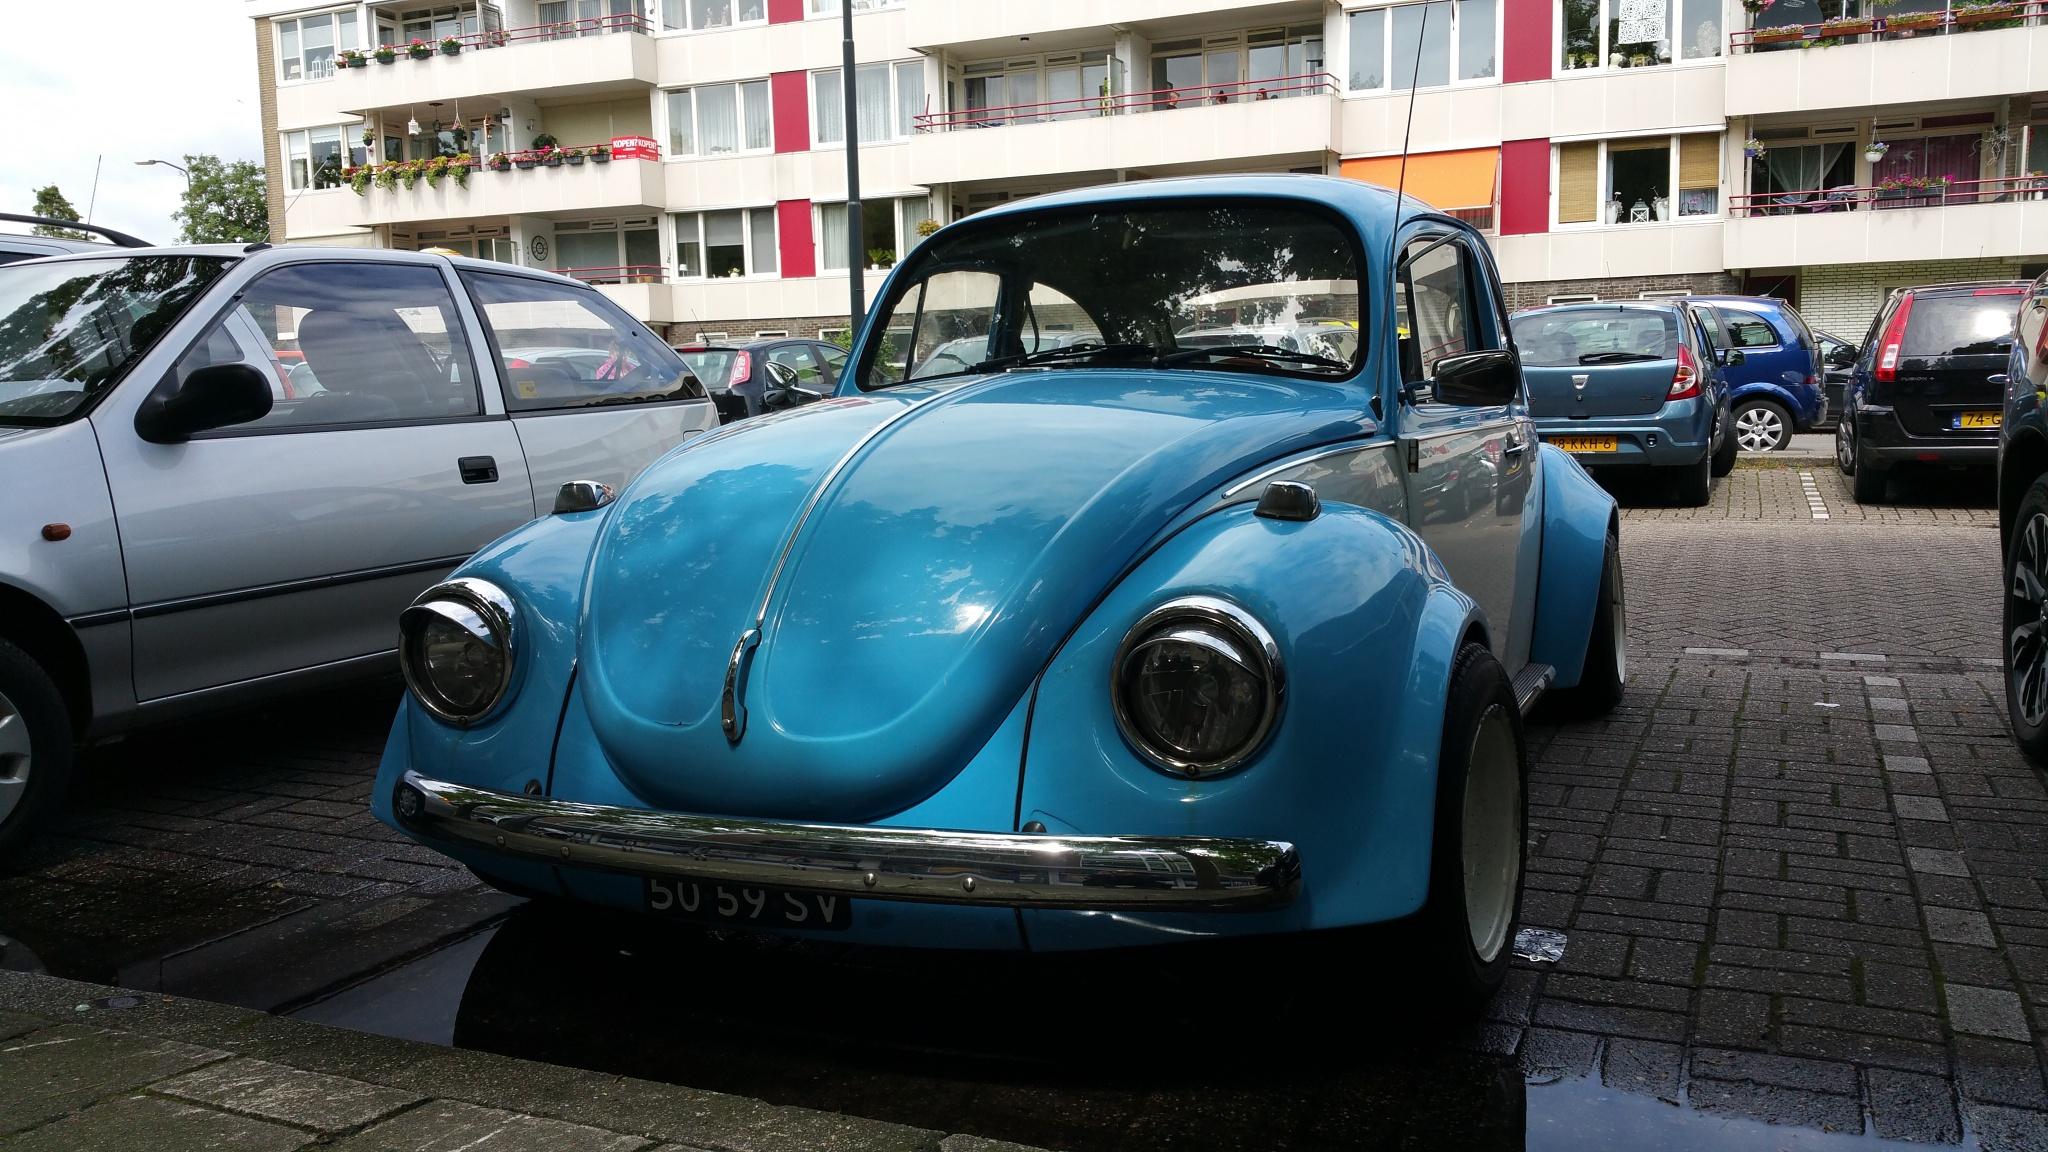 Beetle by Bob66